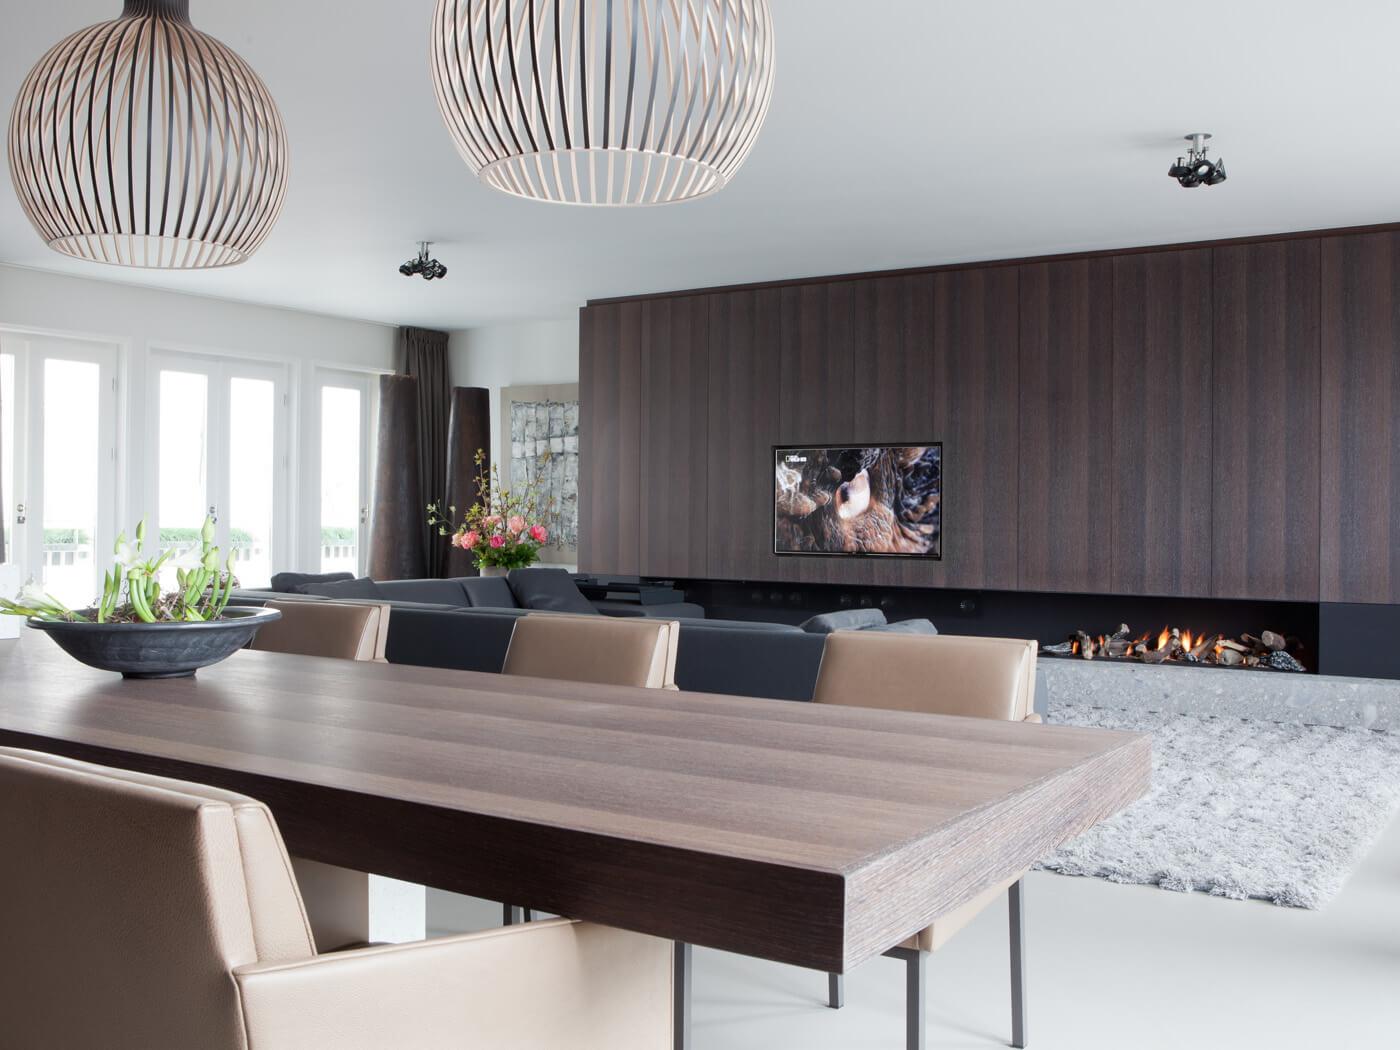 Penthouse Amsterdam Remy Meijers